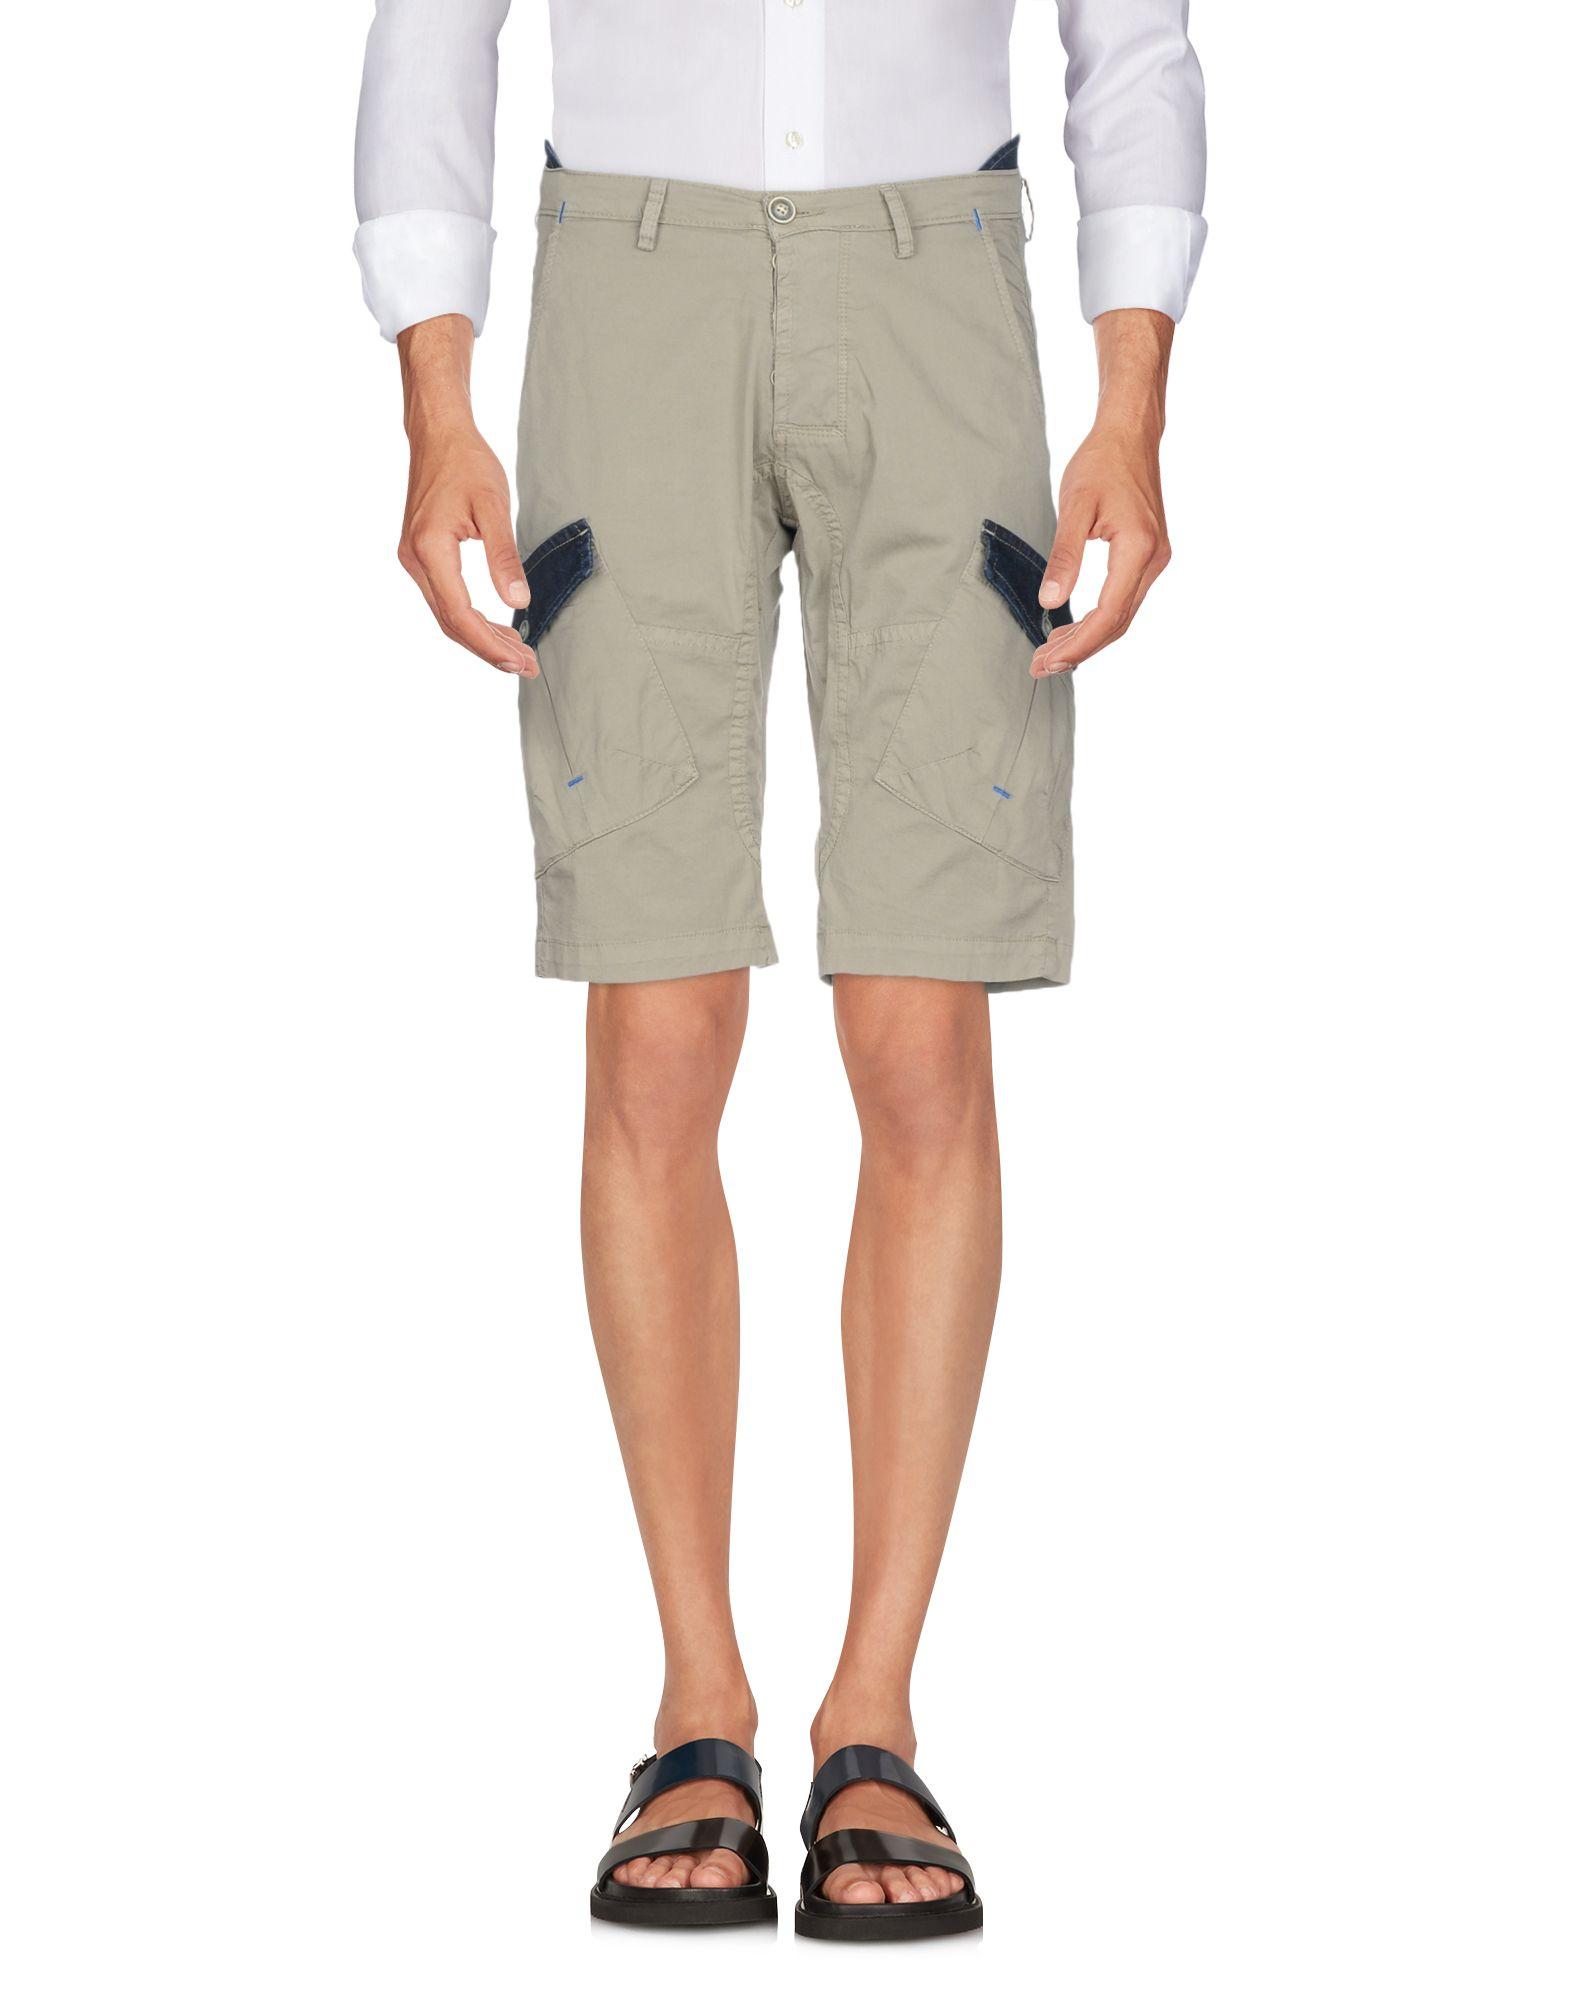 Shorts Shorts Shorts & Bermuda Squad2 Uomo - 13167335DV a00e91